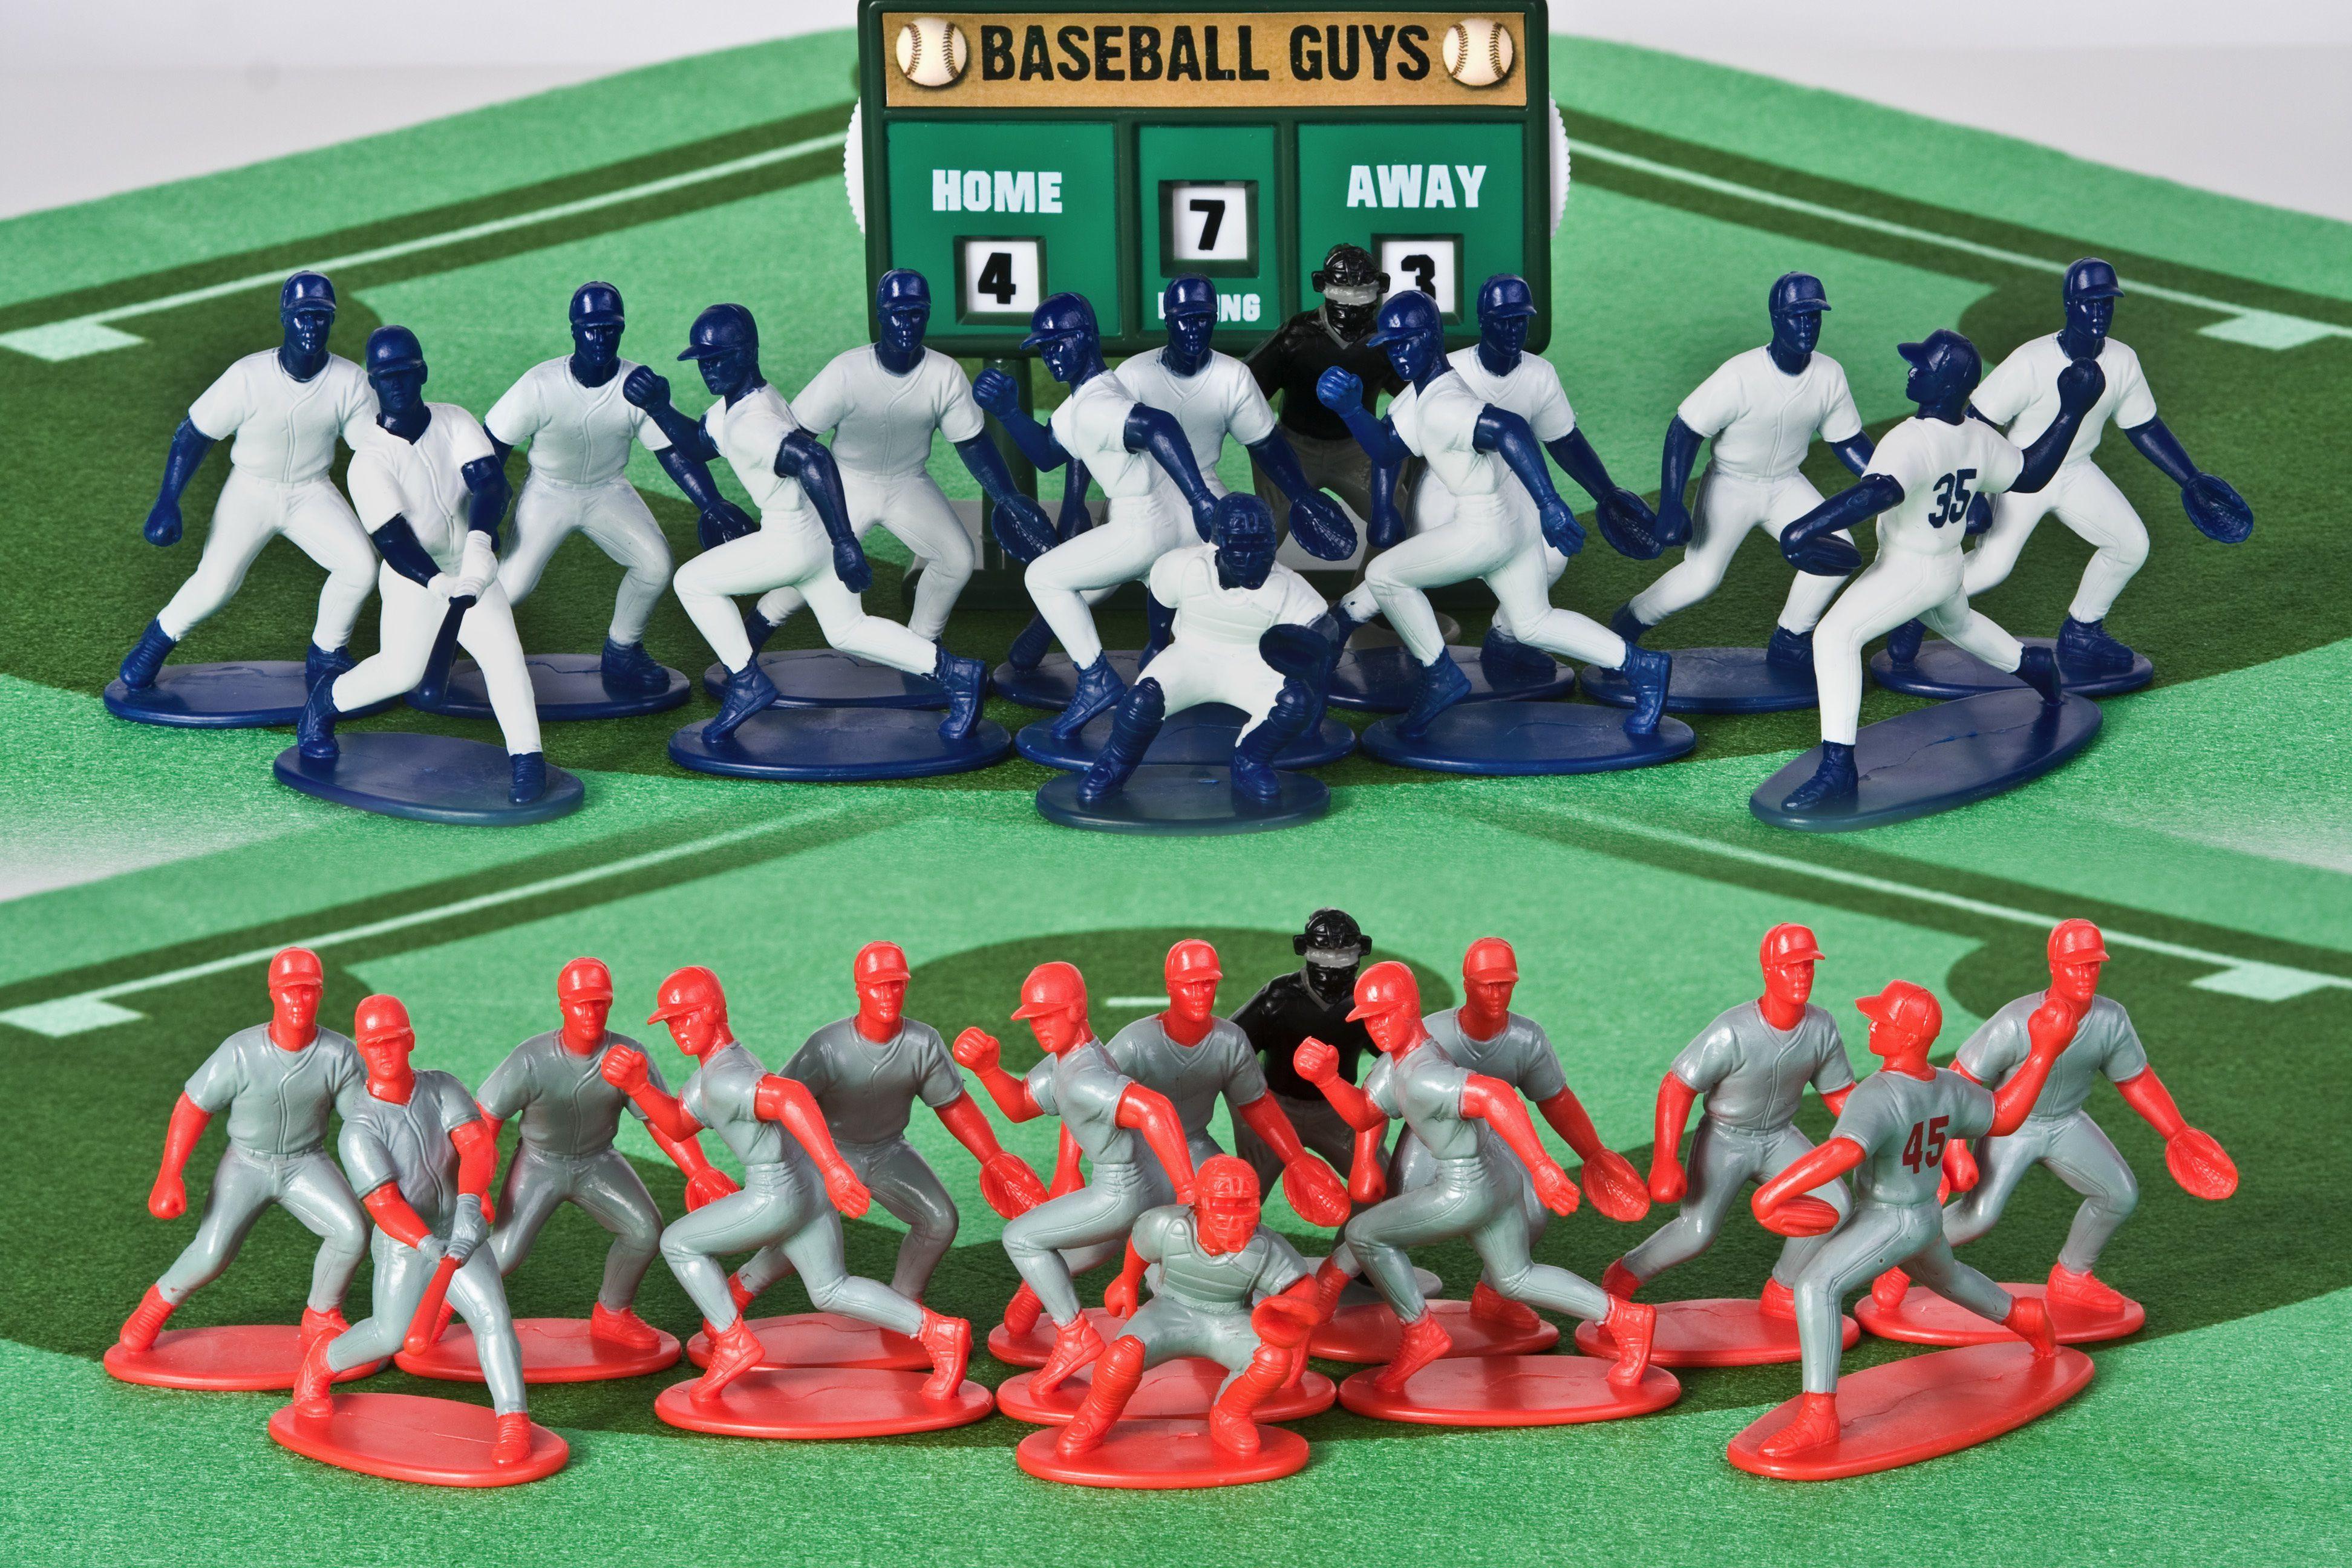 Baseball Guys Action Figure Toys